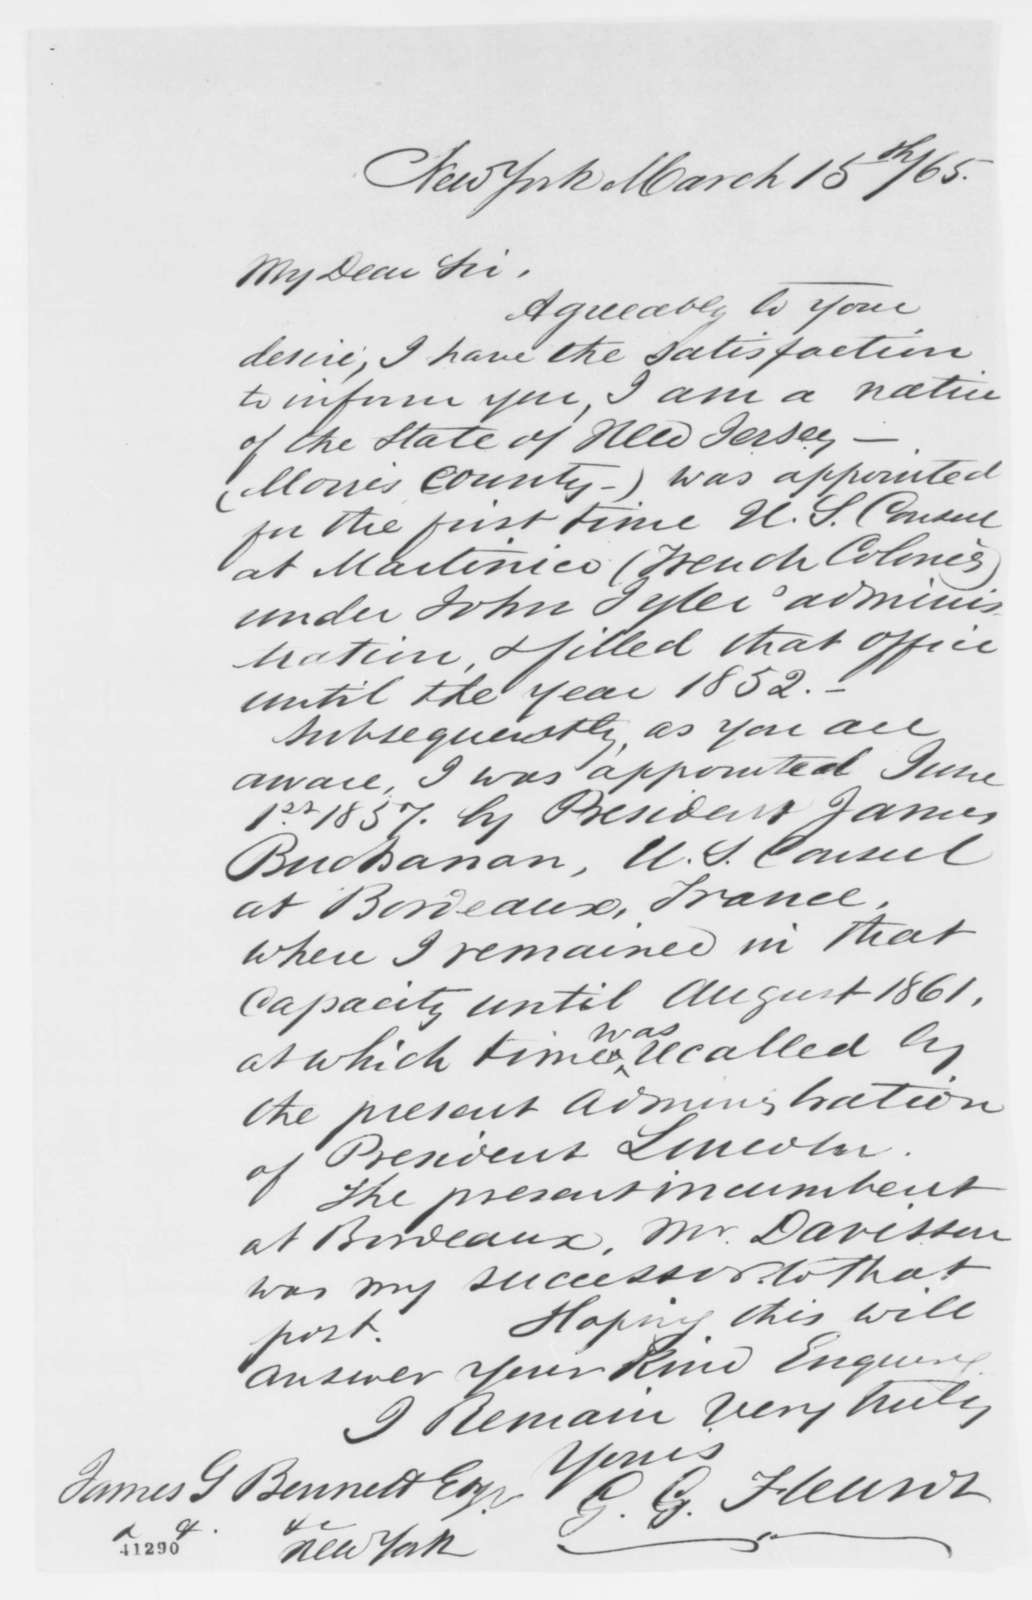 Gabriel G. Fleurot to James Gordon Bennett, Wednesday, March 15, 1865  (Diplomatic patronage)